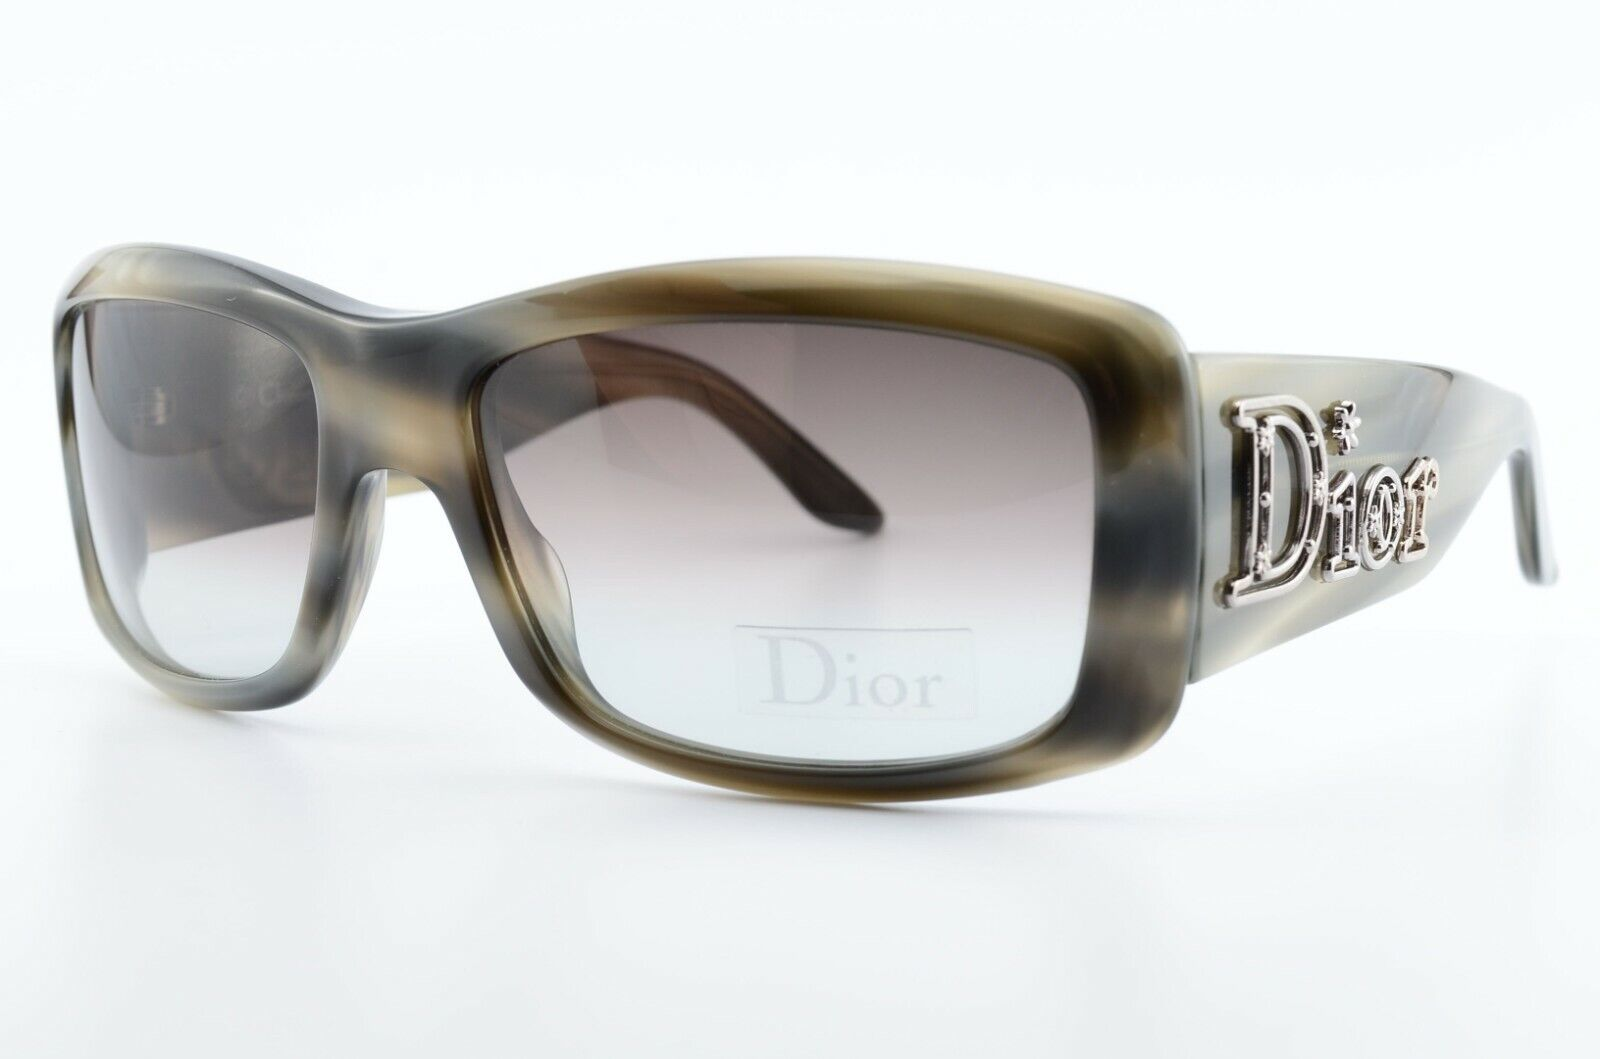 Christian Dior Sunglasses Aventura 2 2W8 16 5/12ft Luxury Pompous Beige Italy